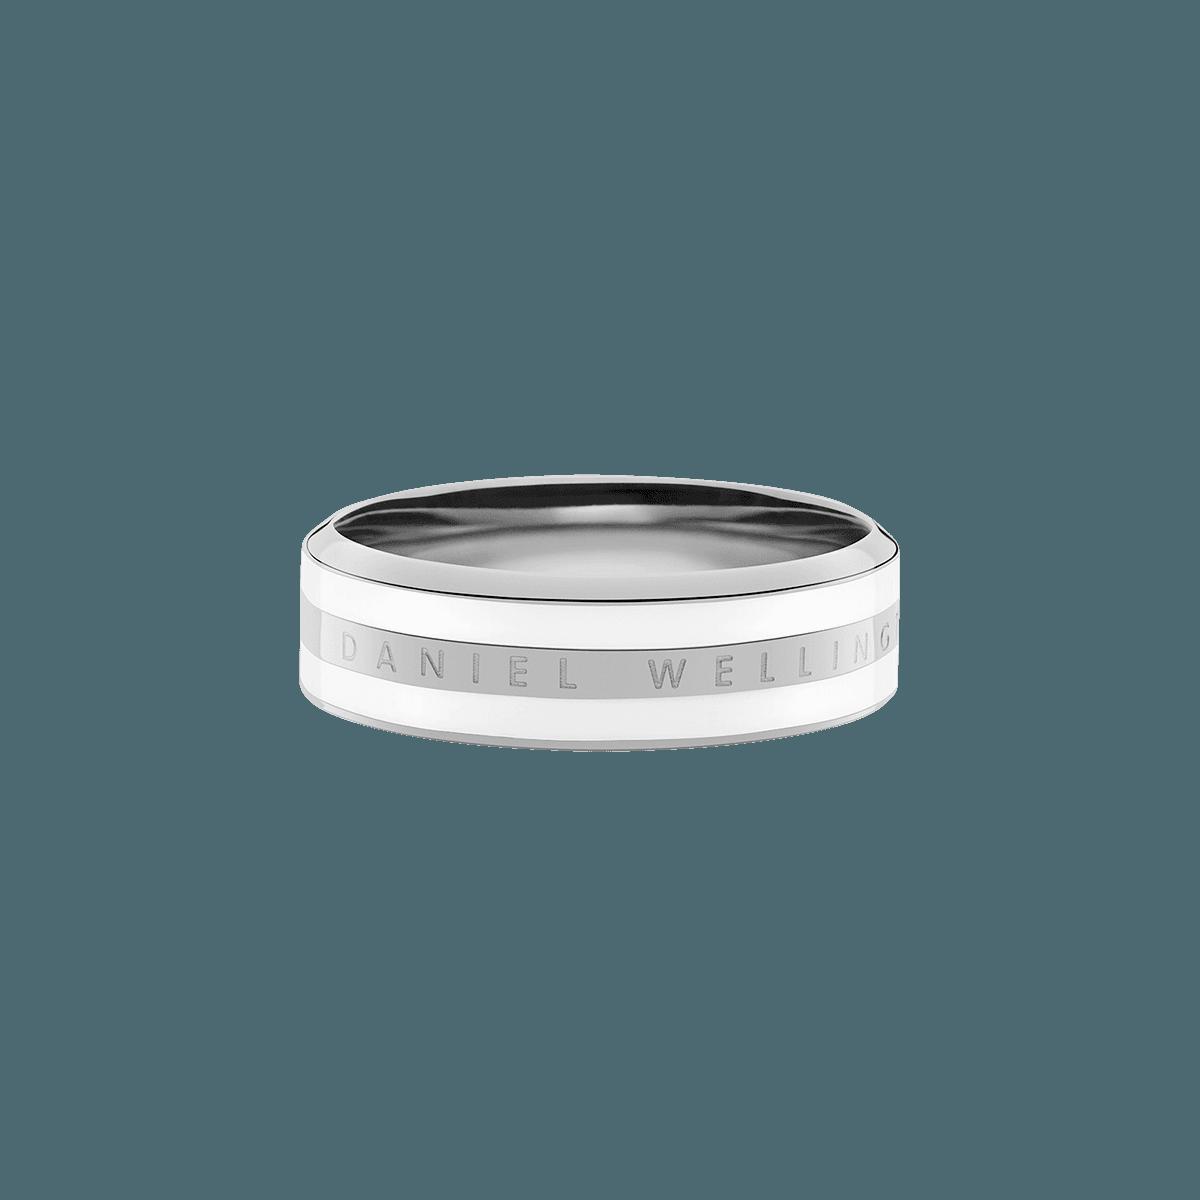 dw官网 dw手表官网 dw中国官网 dw官方旗舰店 DW DW官网  Classic Ring Satin White Silver 54mm